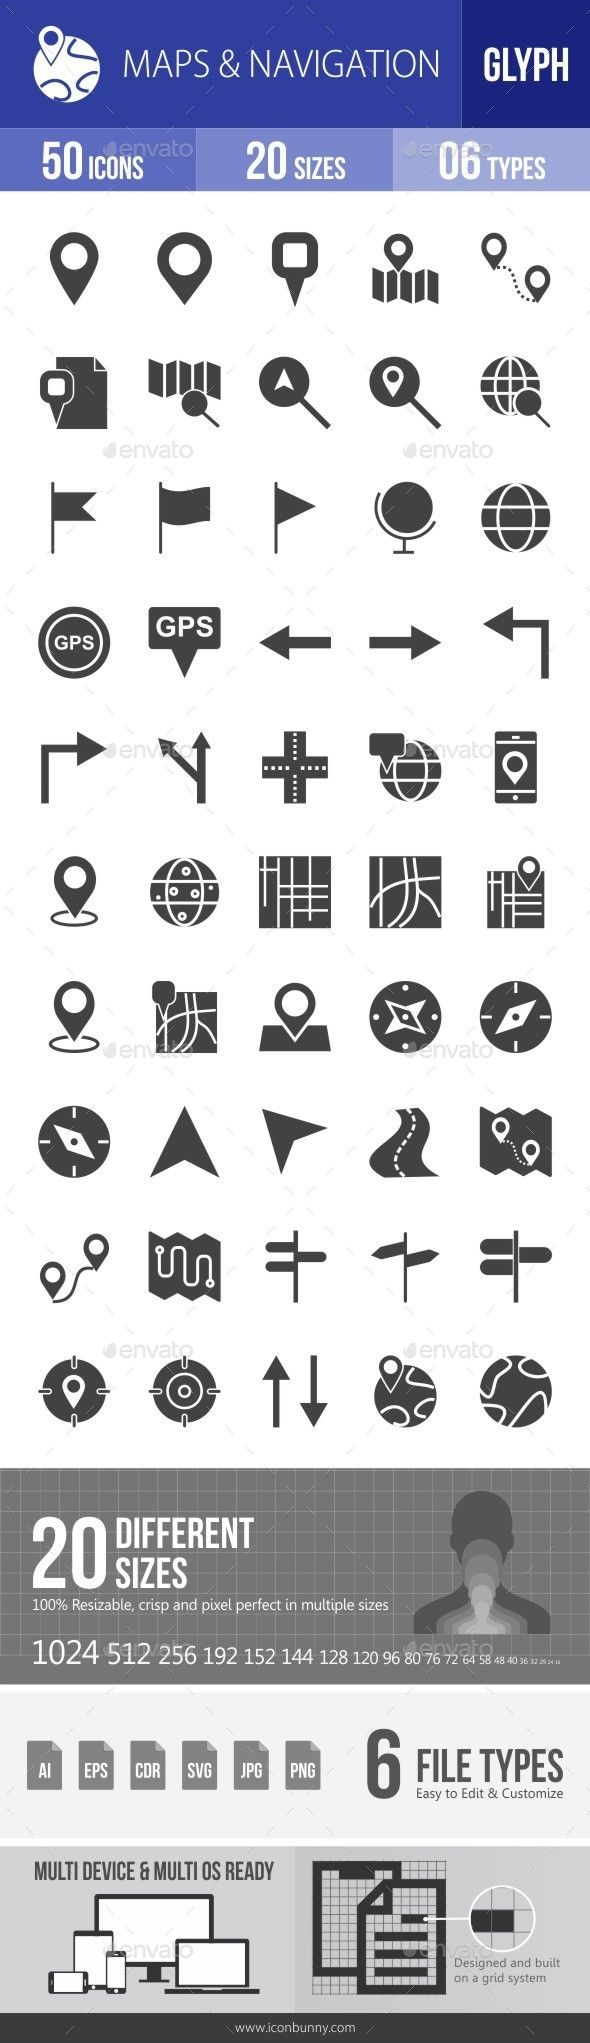 Maps & Navigation Glyph Icons